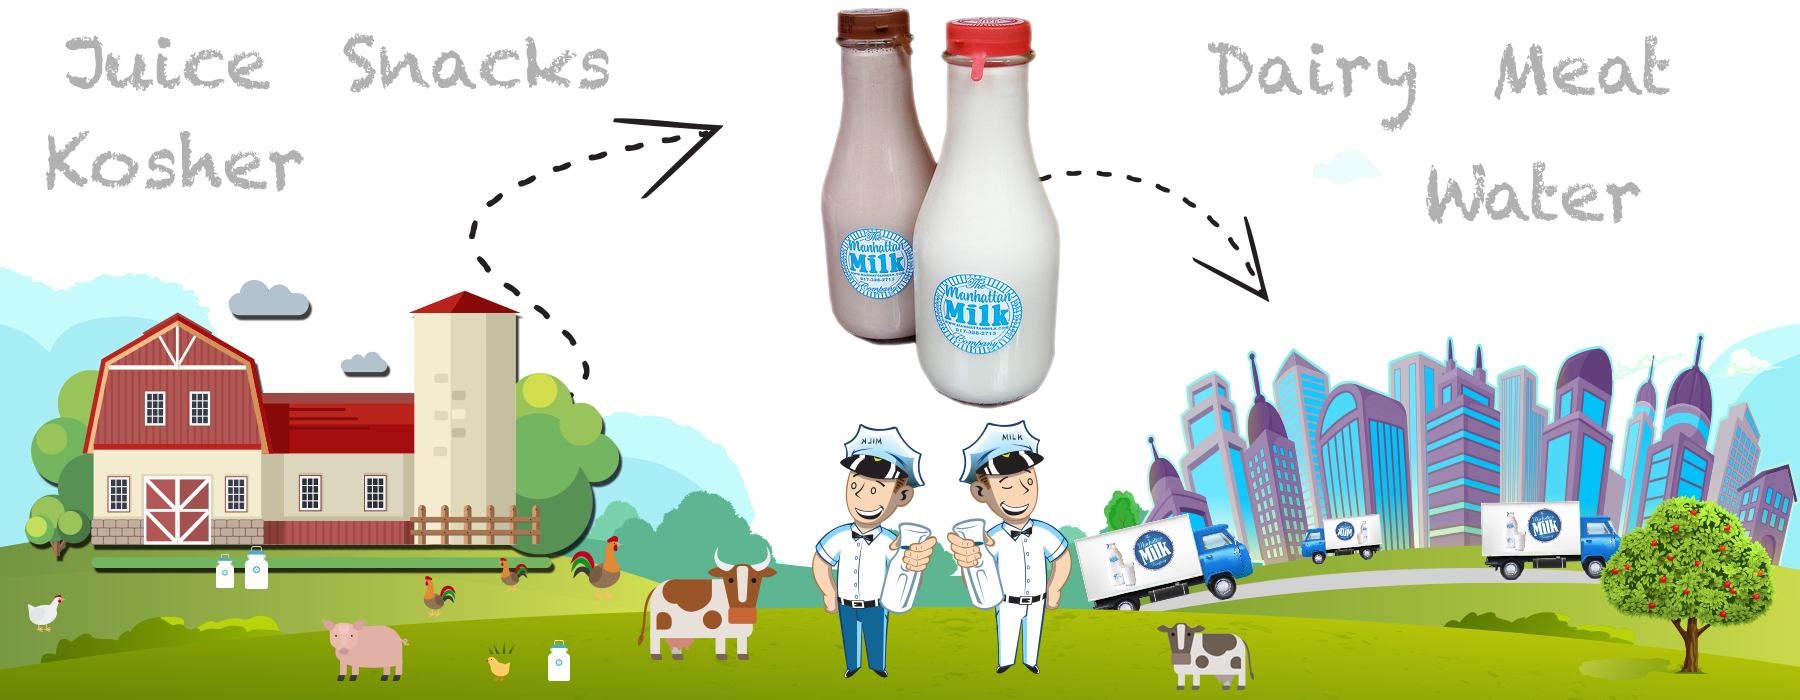 Clipart milk raw milk. Manhattan we cover your